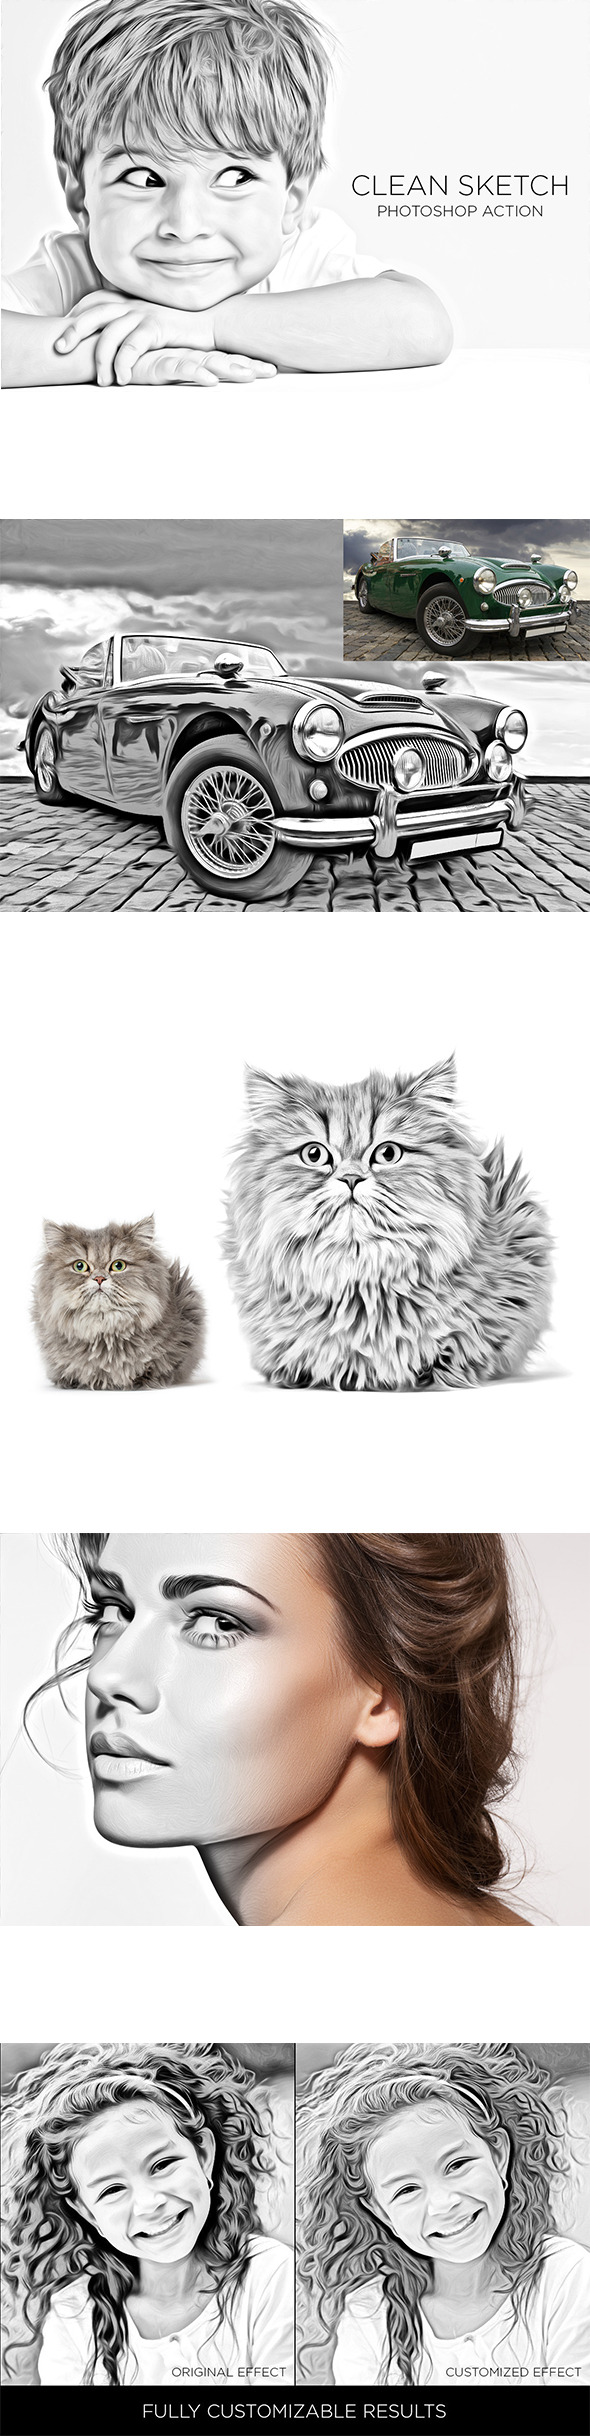 GraphicRiver Clean Sketch Photoshop Action 9140104